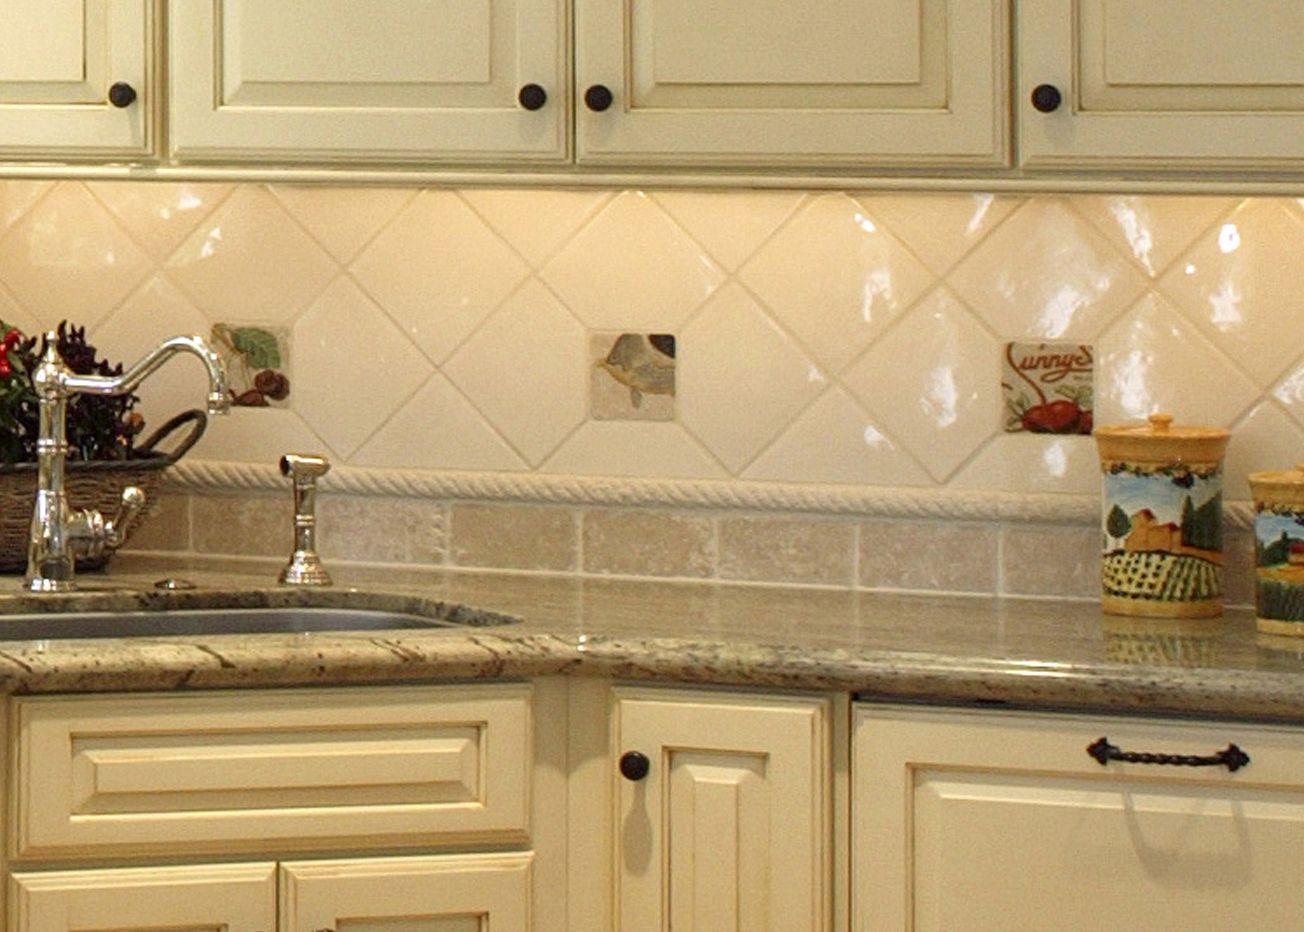 Will Use Ceramic Tiles From Wineries I Have Visited Kitchen Backsplash Designs Kitchen Backsplash Tile Designs Kitchen Tiles Backsplash